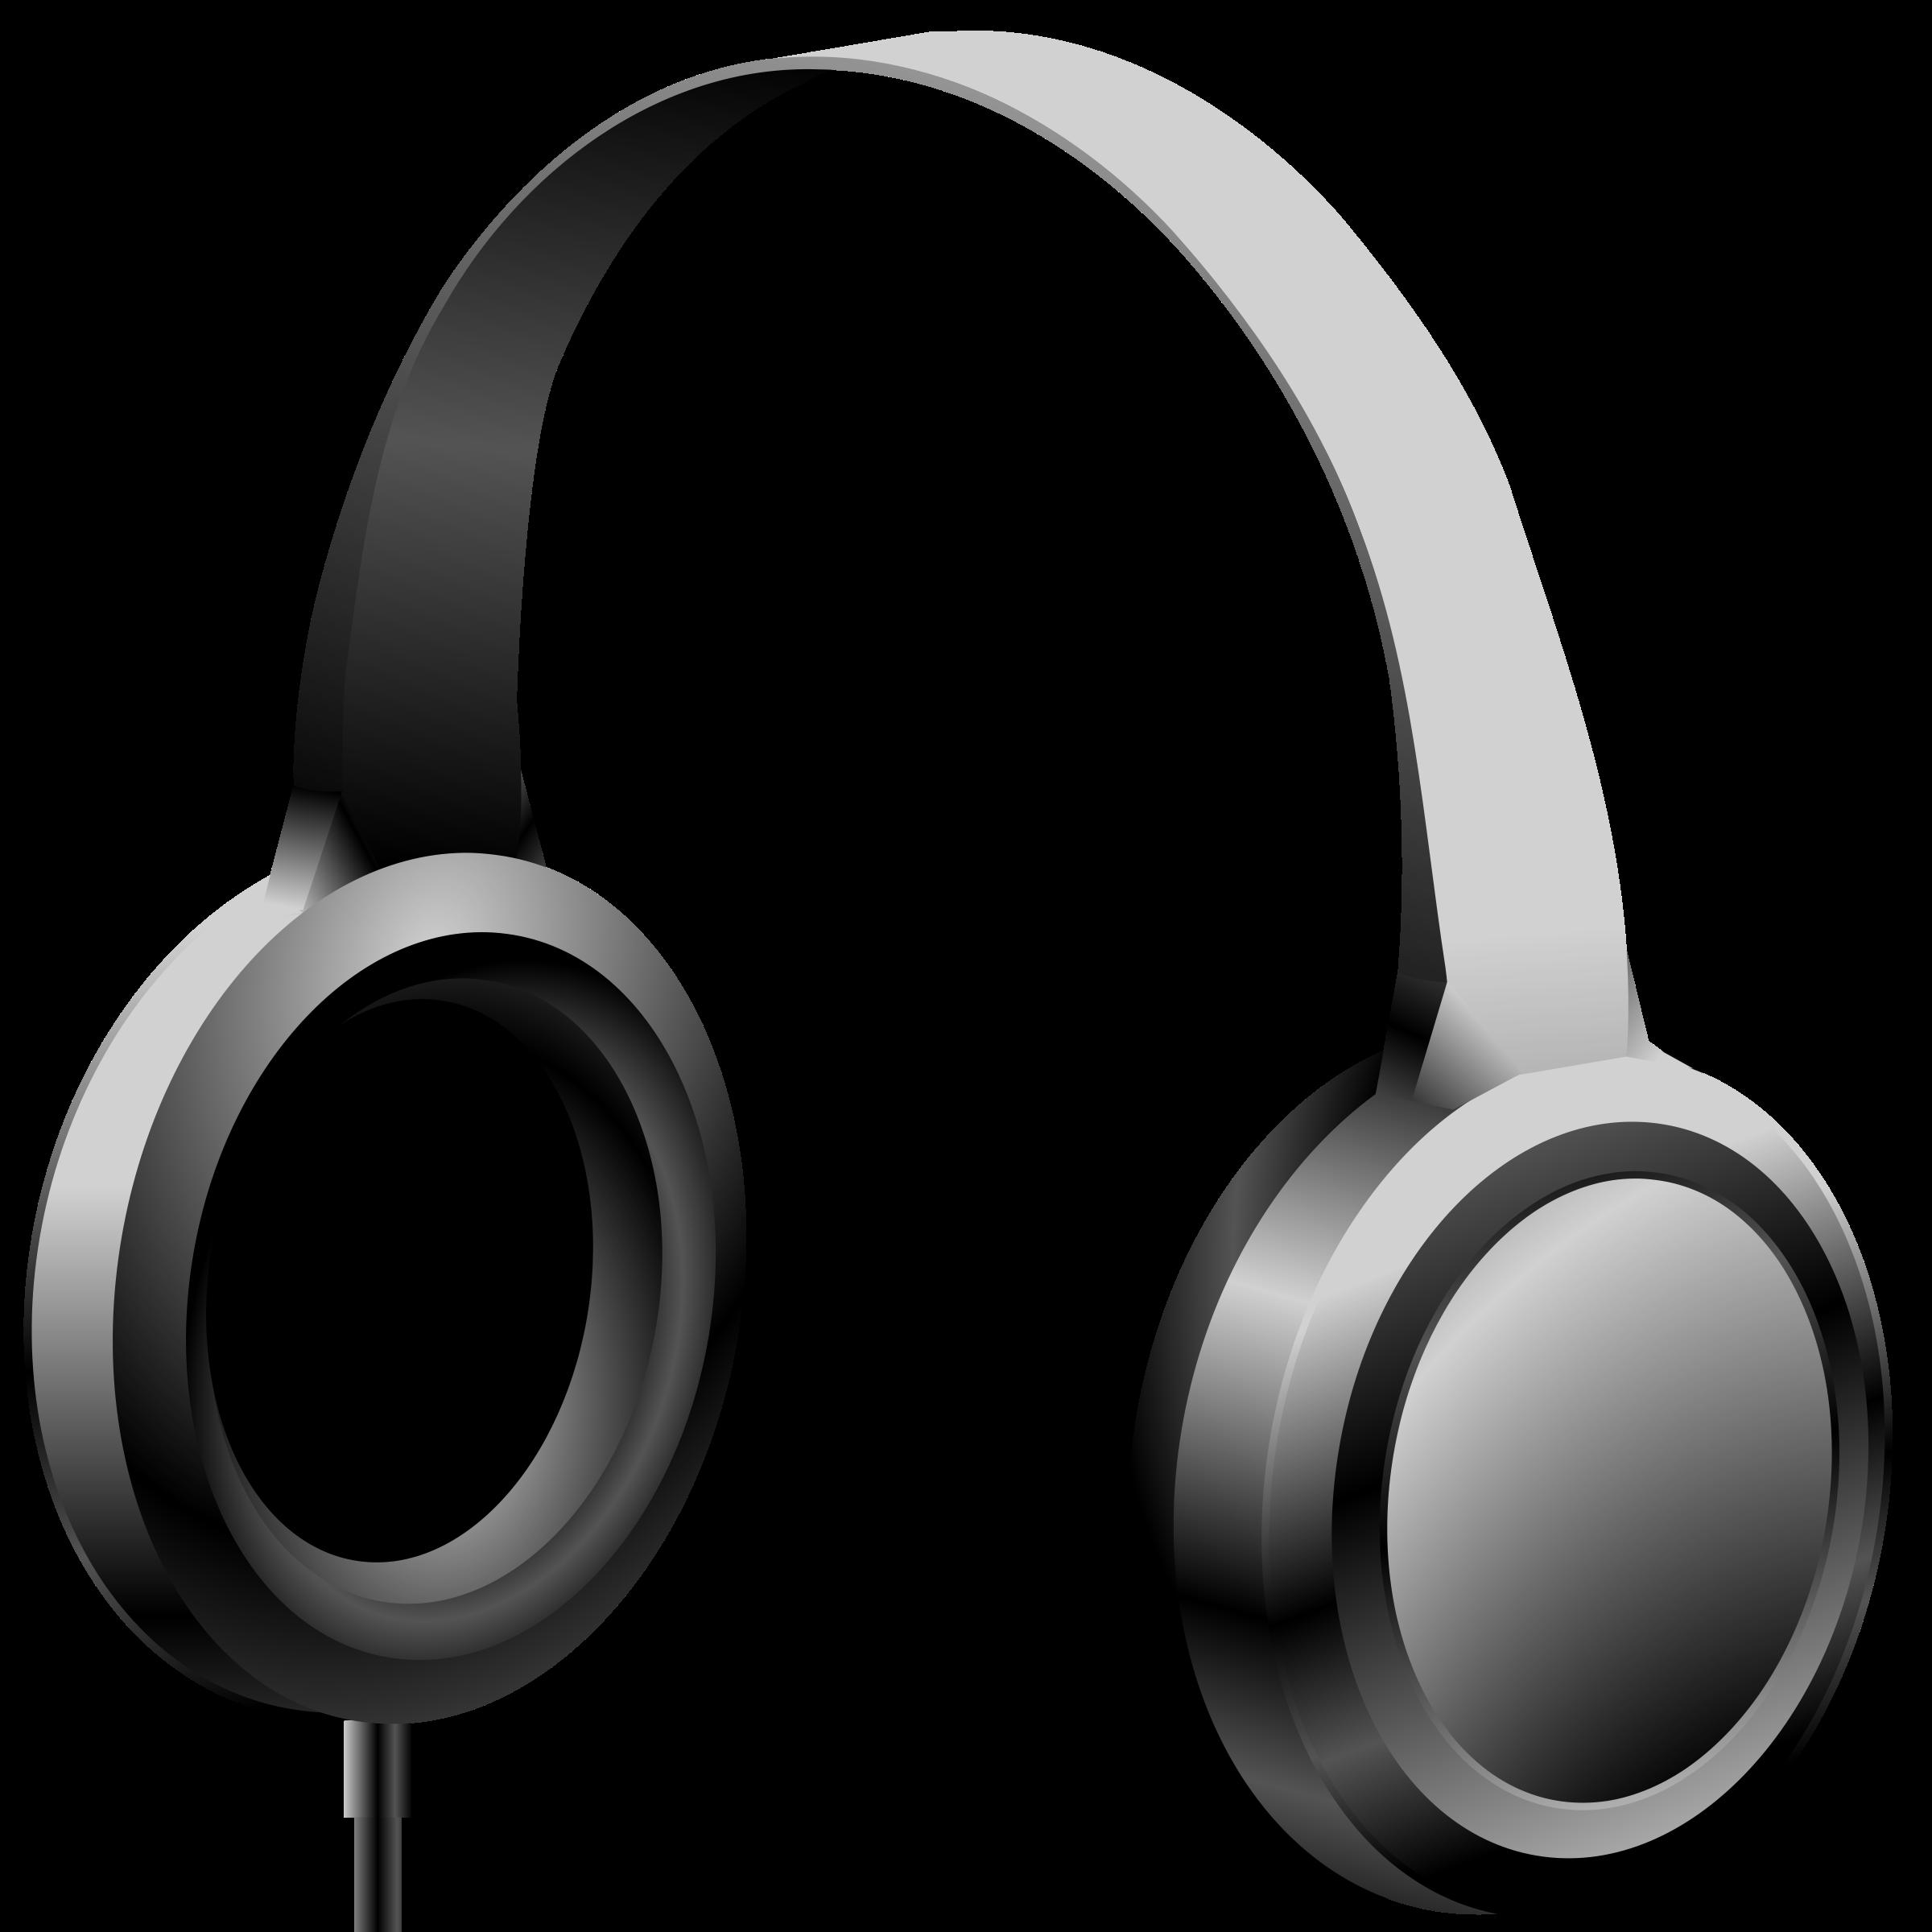 Headphones Png Image #20176 - Headphones, Transparent background PNG HD thumbnail